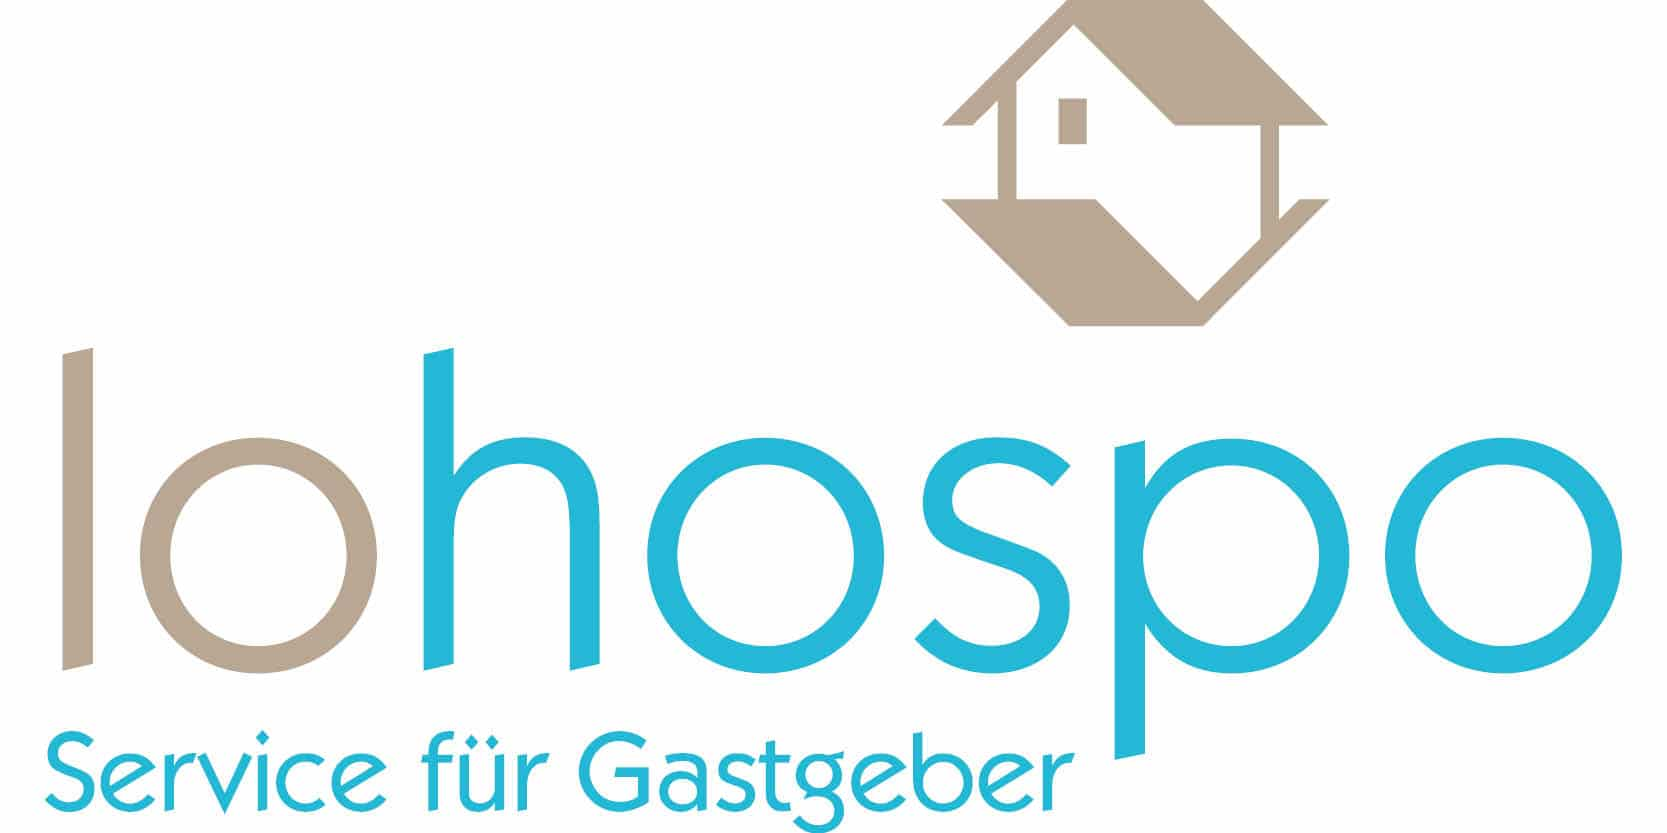 Lohospo - Vertrieb für Ferienunterkünfte & Destinationen